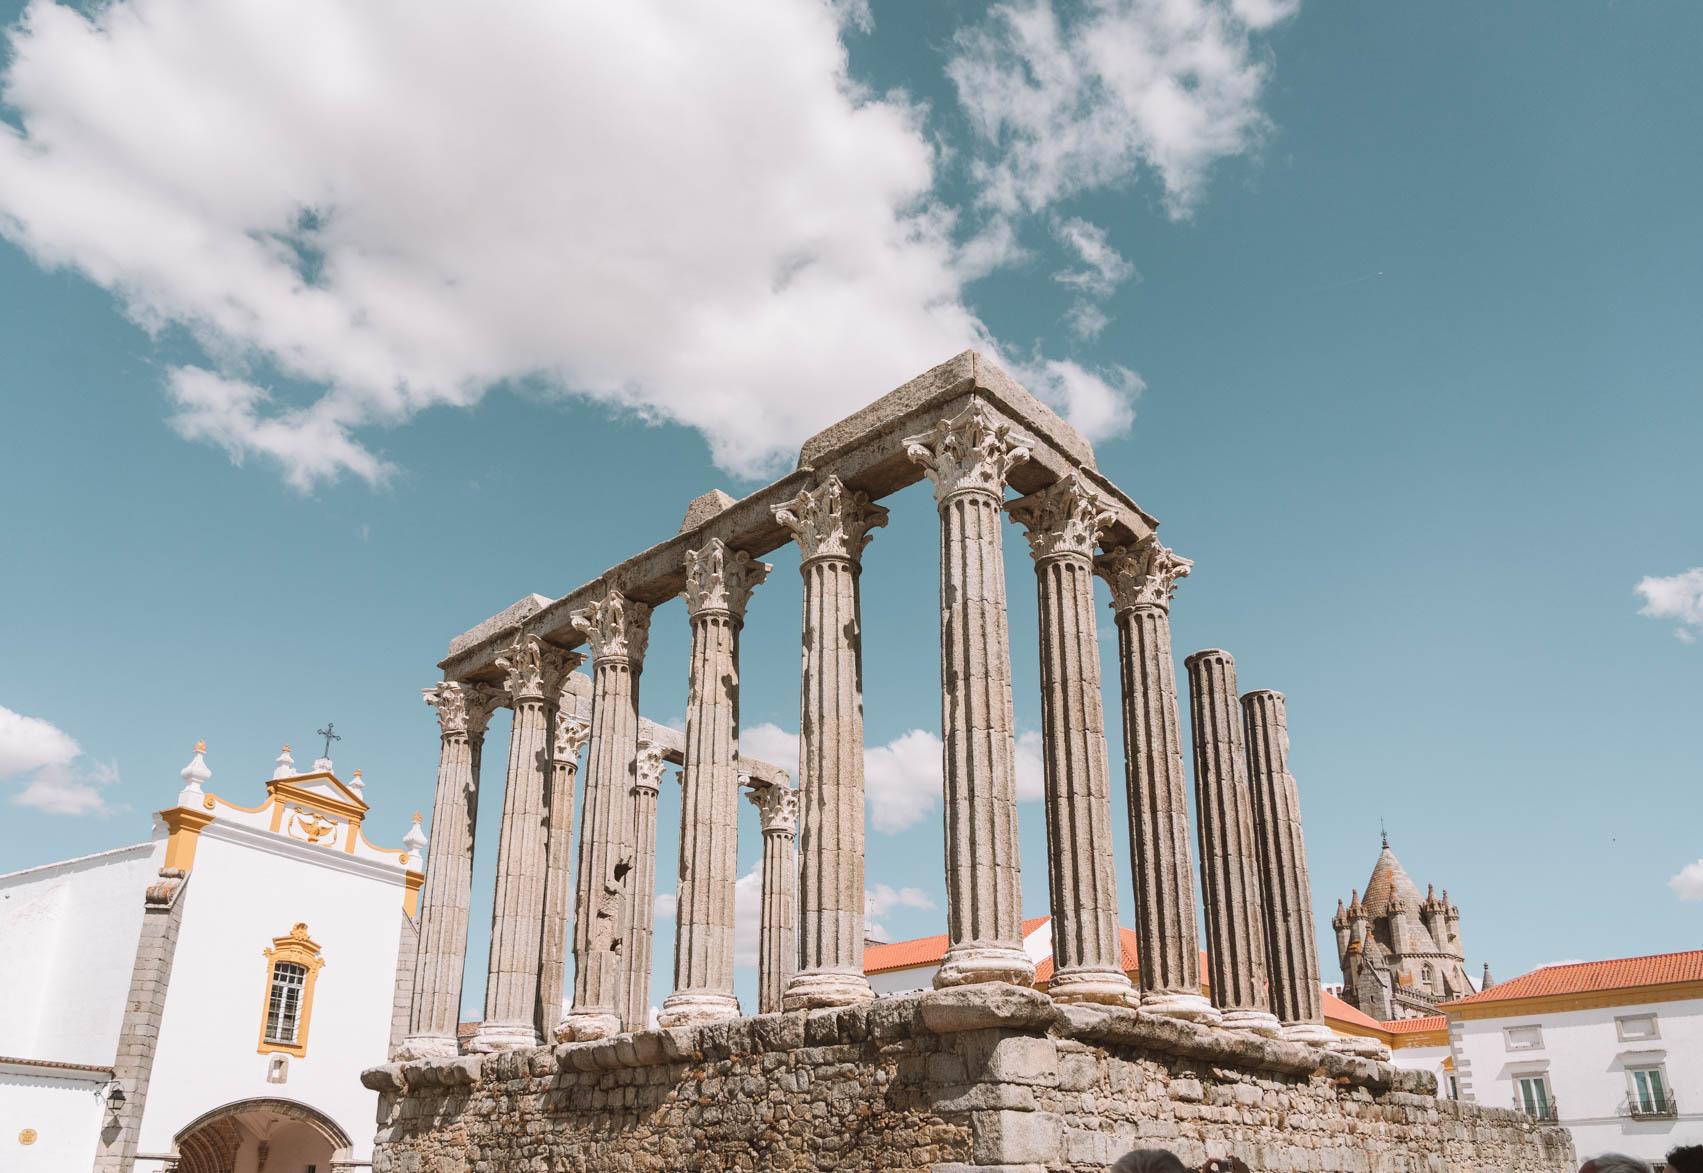 Evora Alentejo - Exploring 10 days exploring Portugal on a road trip #Europe #Portugal